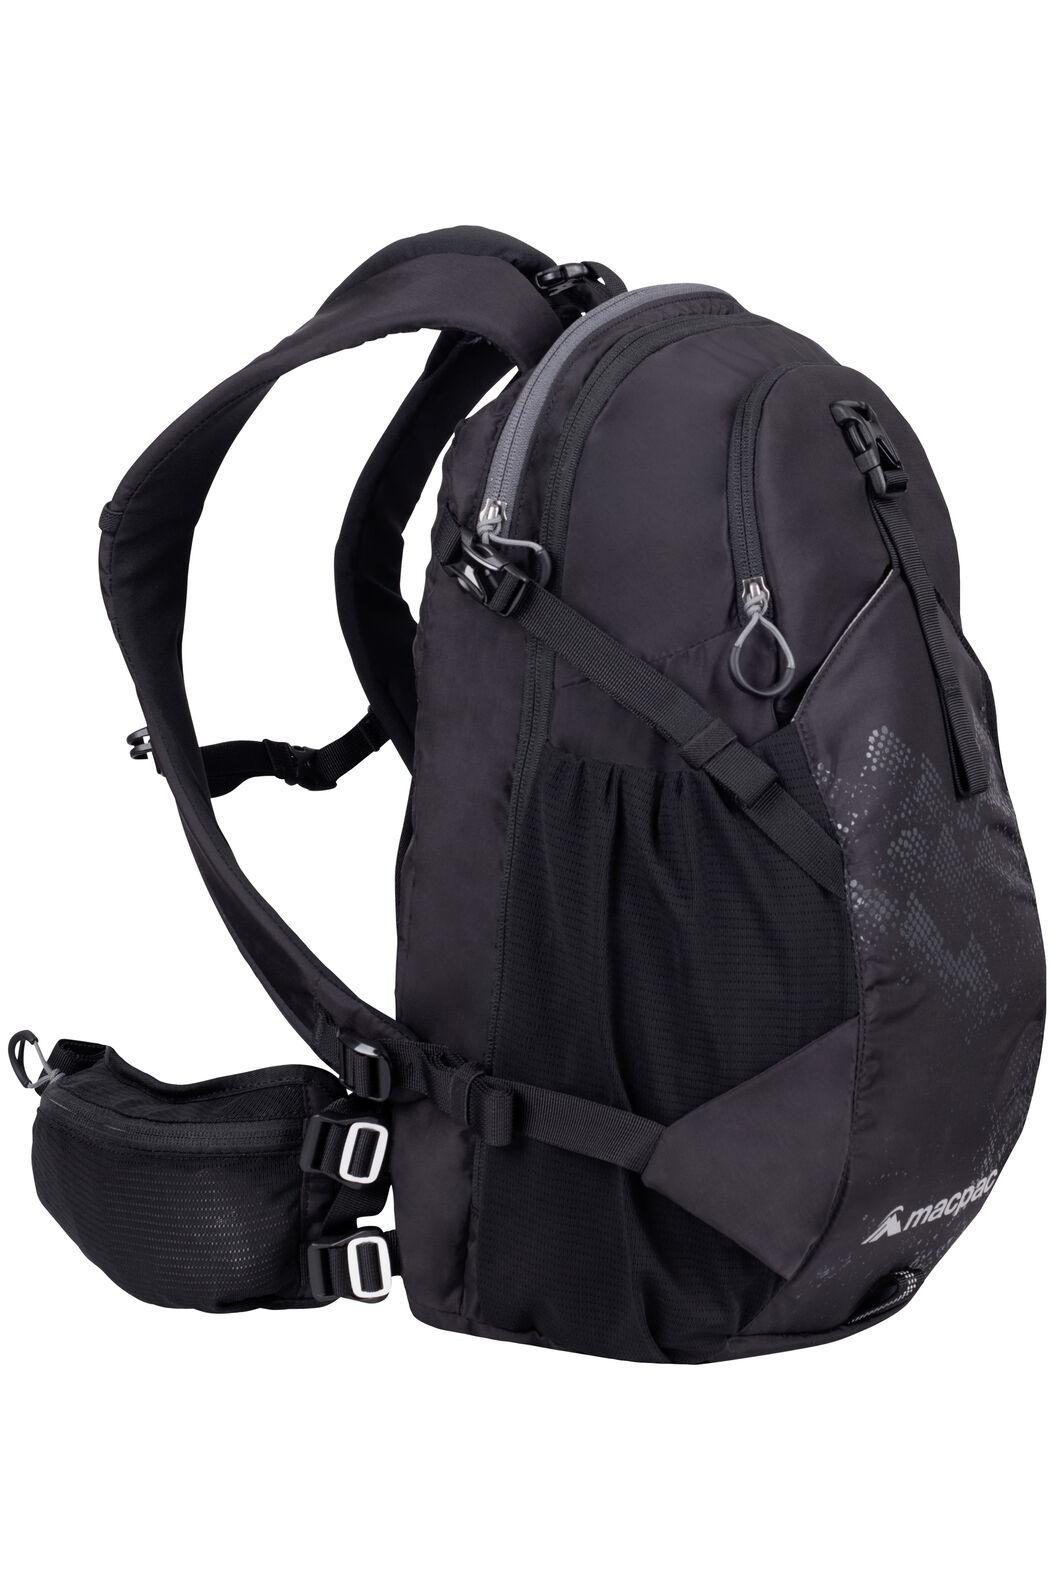 Mountain Bike 18L Pack, Black, hi-res